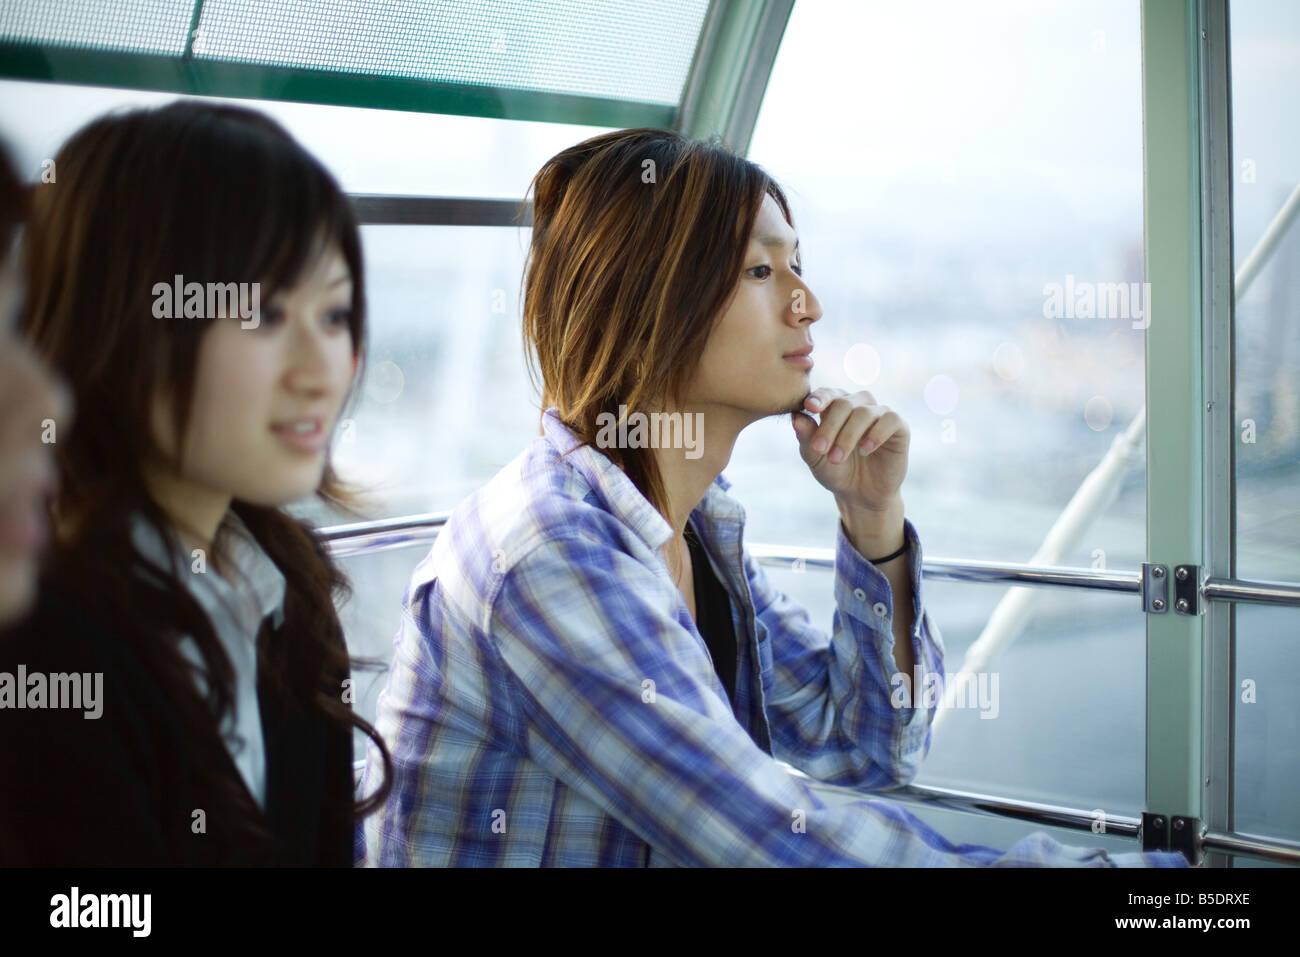 Friends taking ride on Ferris wheel at Tempozan Harbour Village, Osaka, Japan Stock Photo